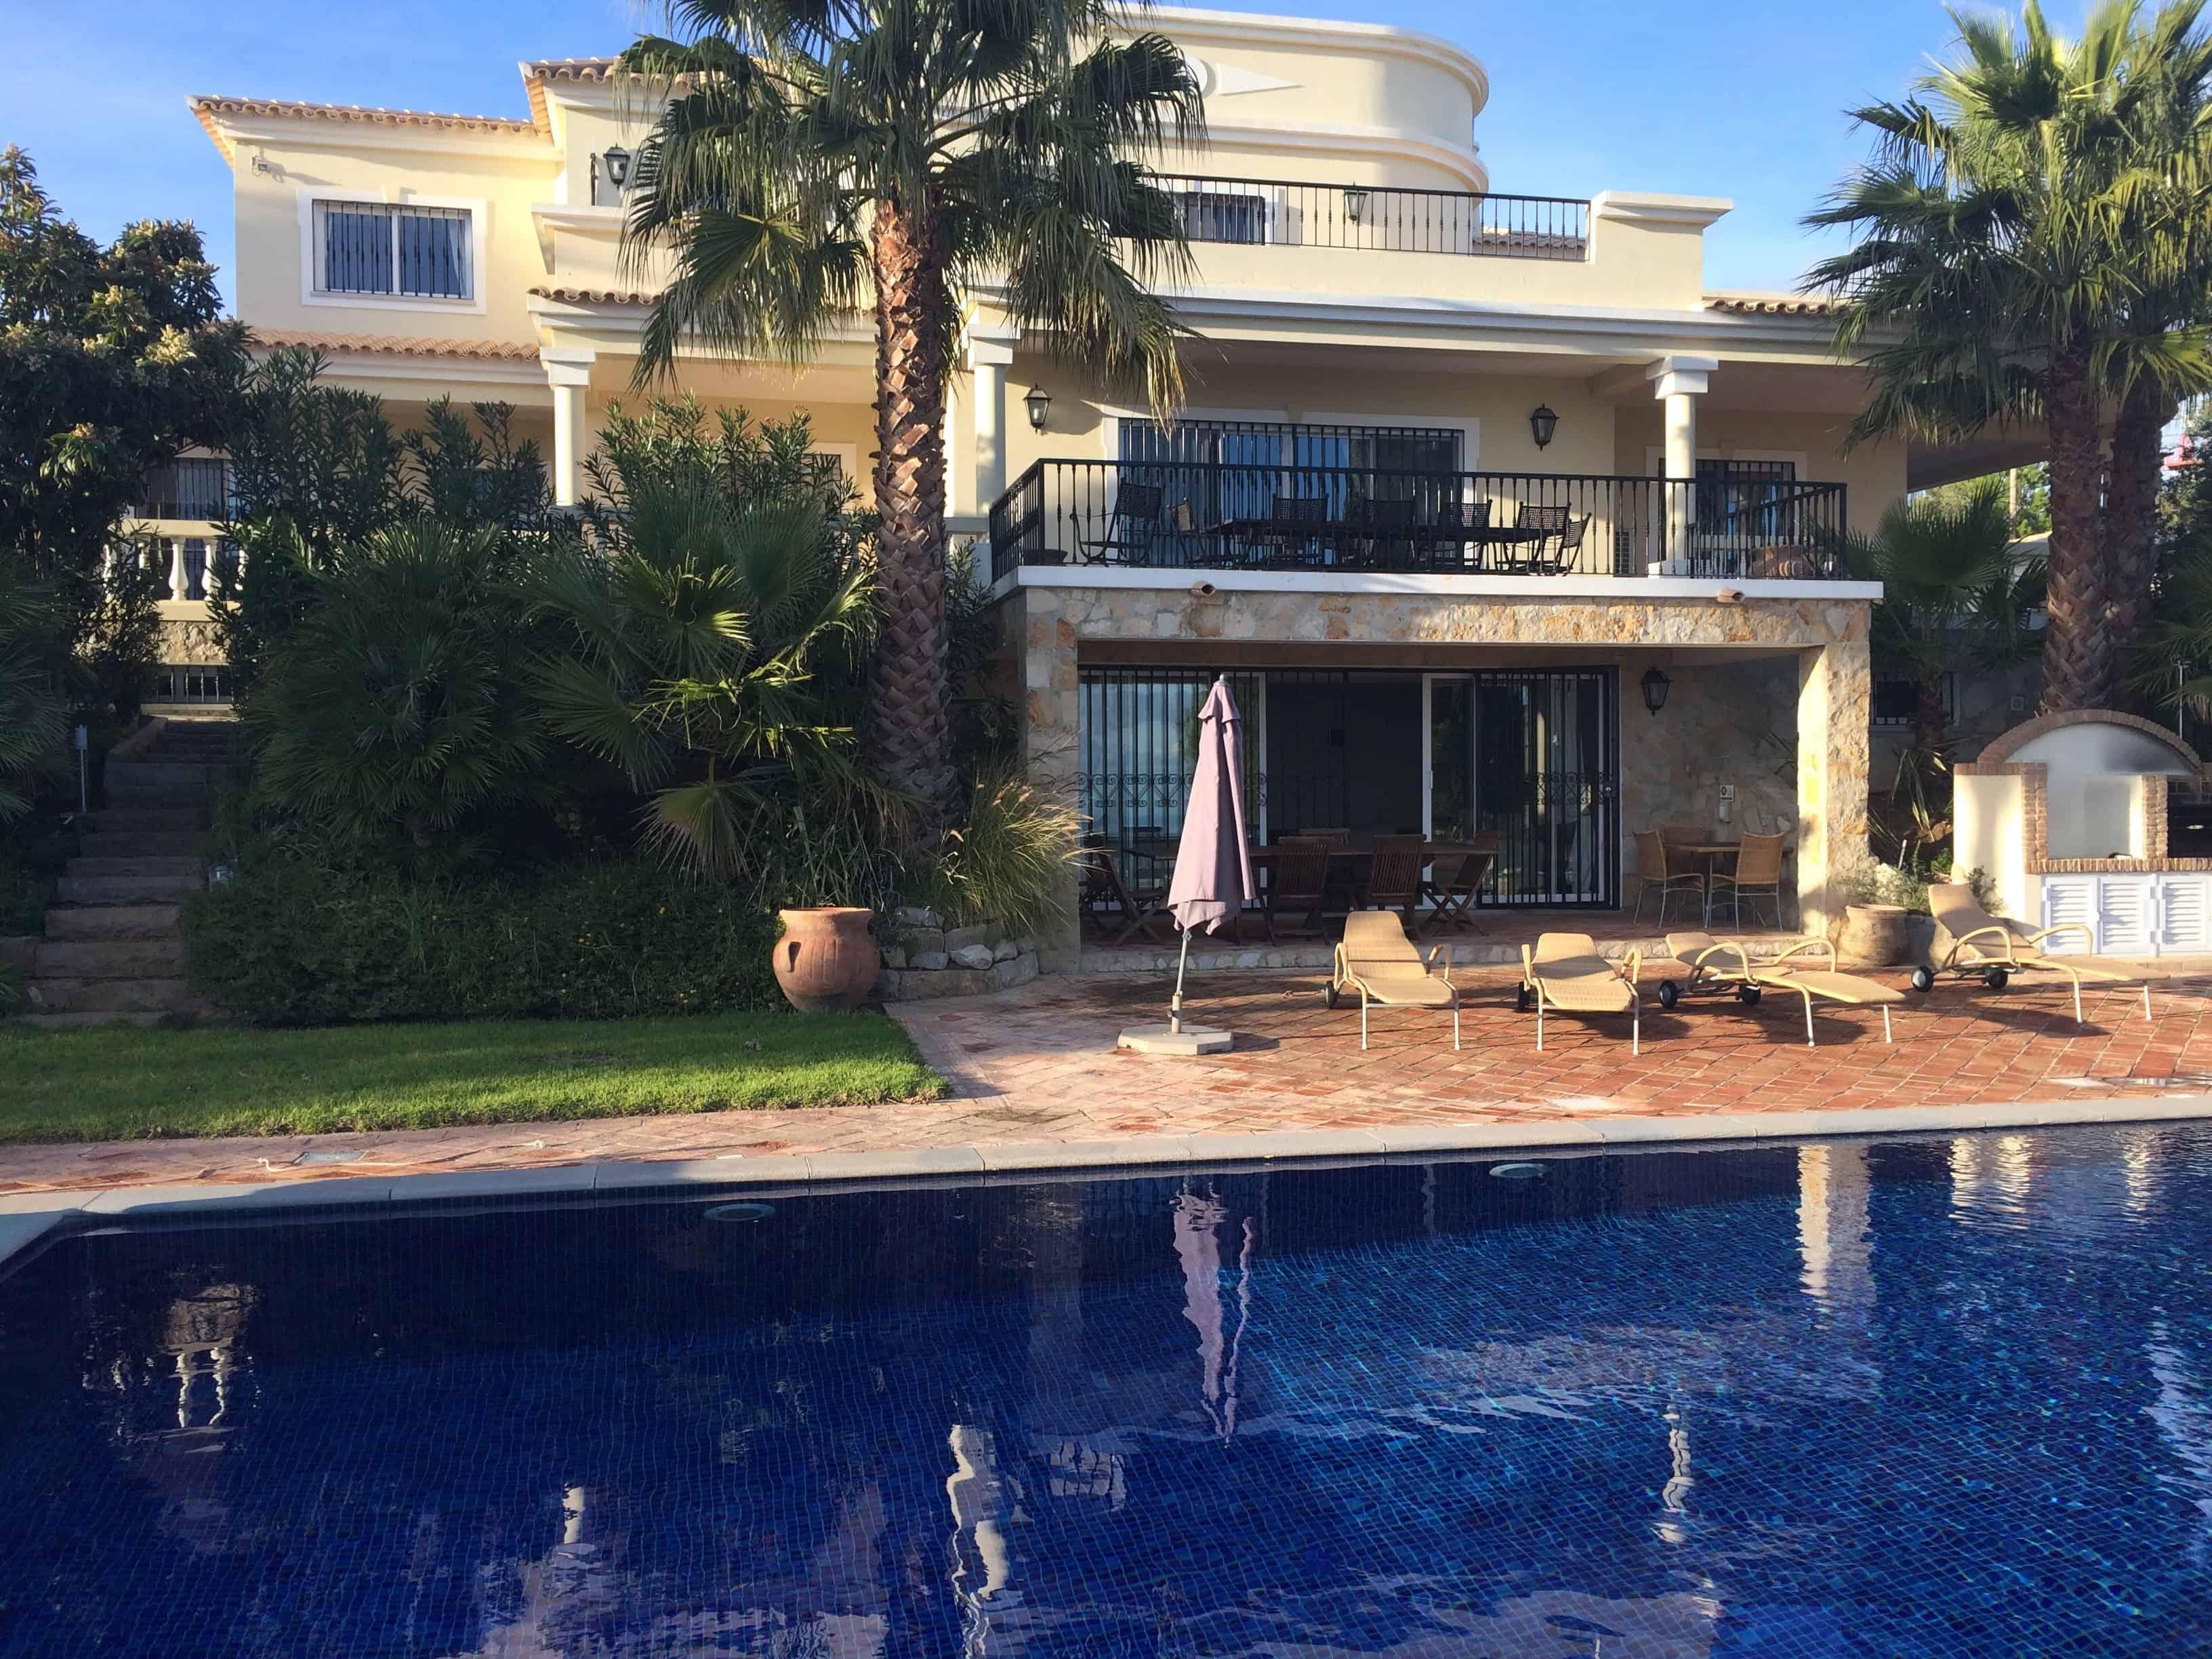 Loule algarve portugal outdoor solar swimming pool - Solar hot water heater for swimming pool ...